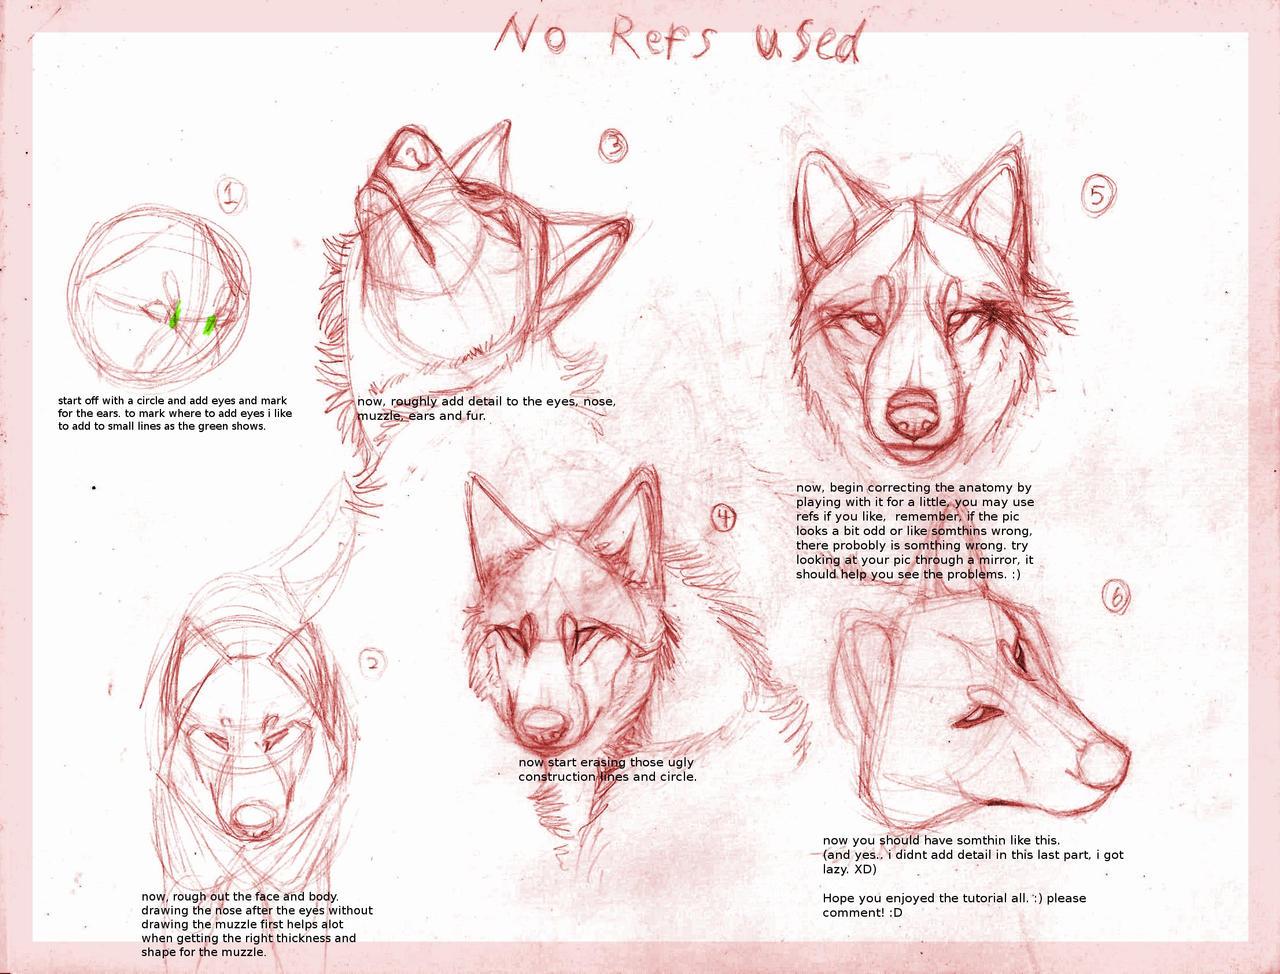 http://fc03.deviantart.net/fs70/i/2010/204/a/1/Wolf_drawing_tutorial_by_B_theawsomegeek.jpg